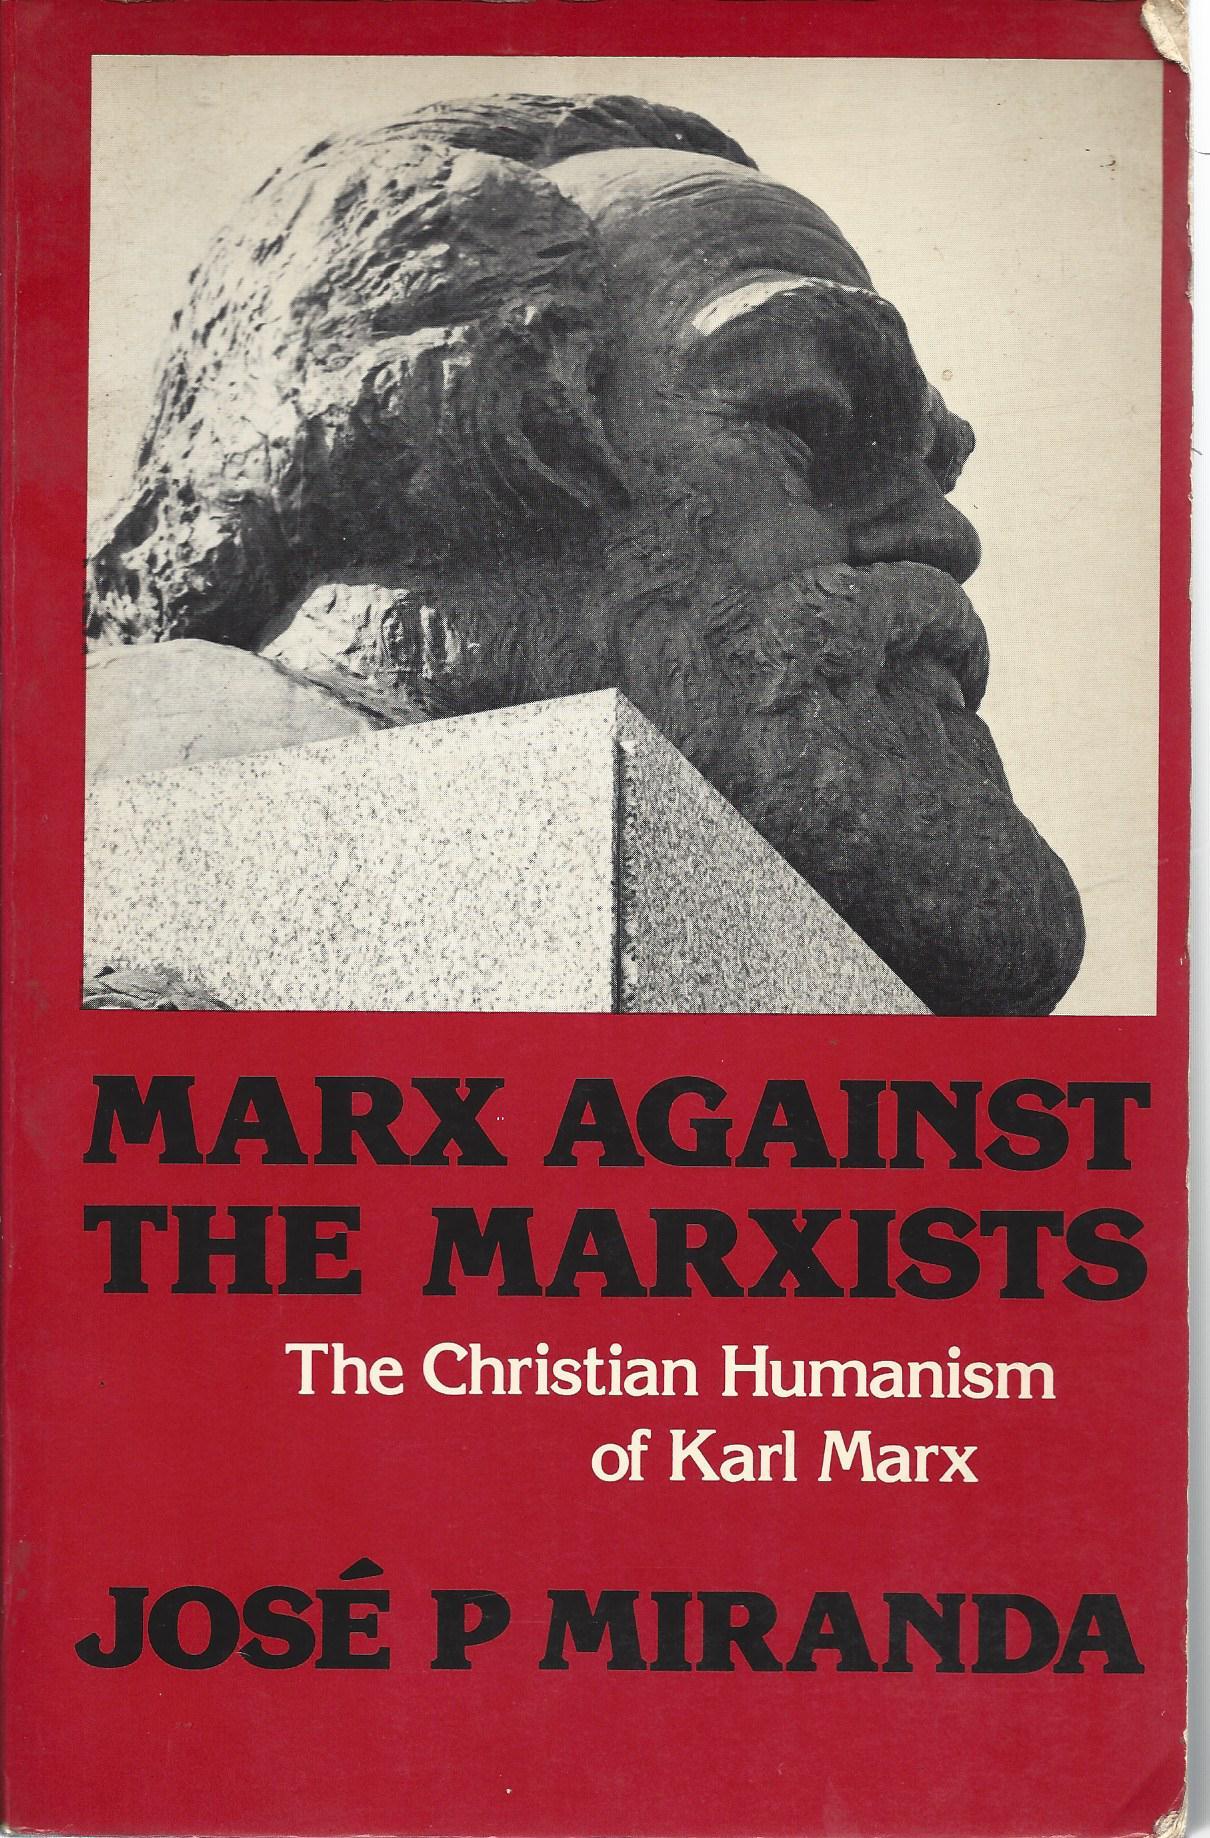 Marx against tmarxists primera edici¢n britanica1980 por SCM Pr